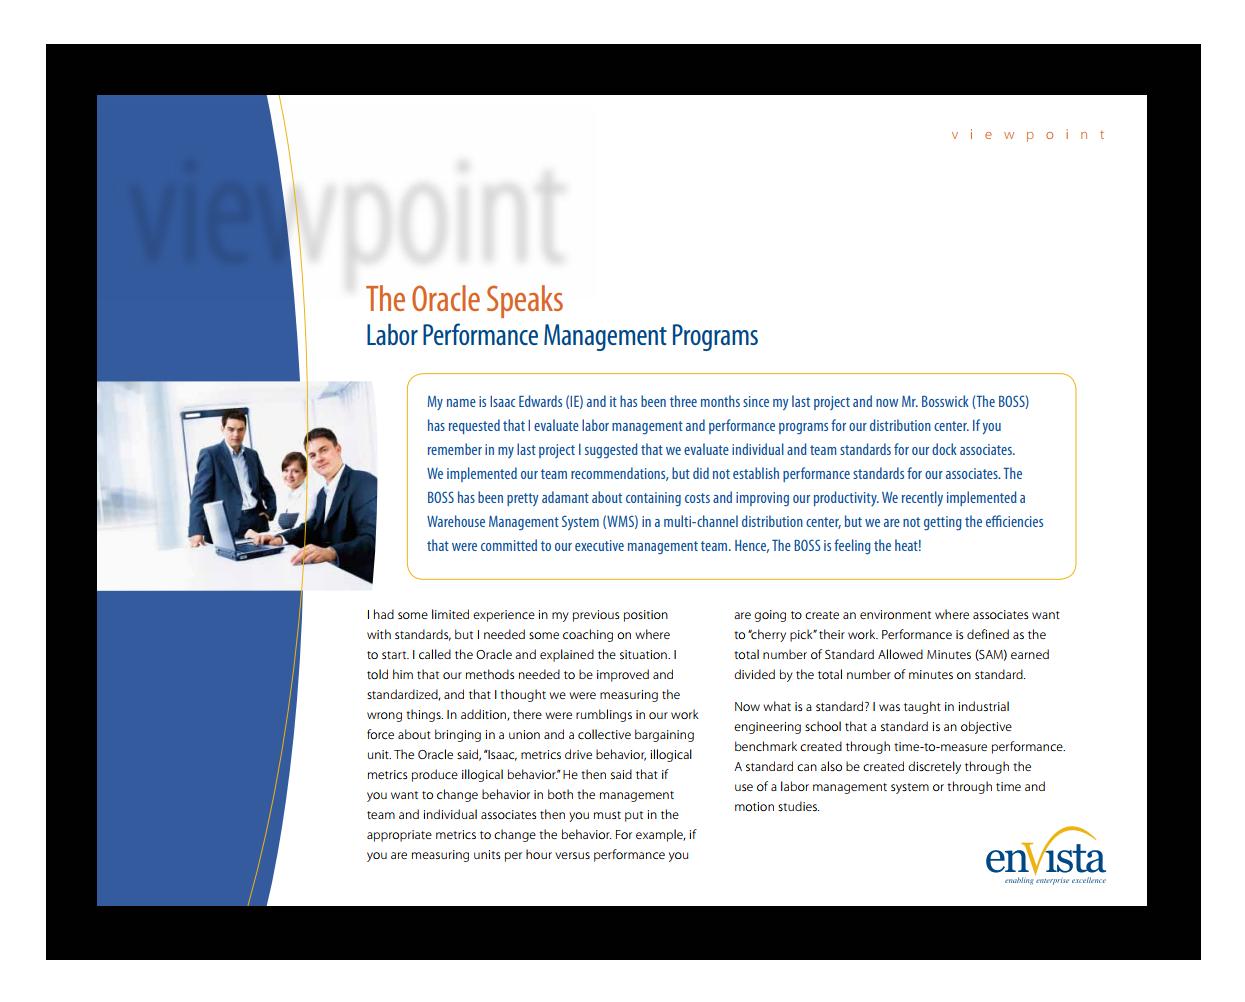 Image_labor-performance-management-programs.png